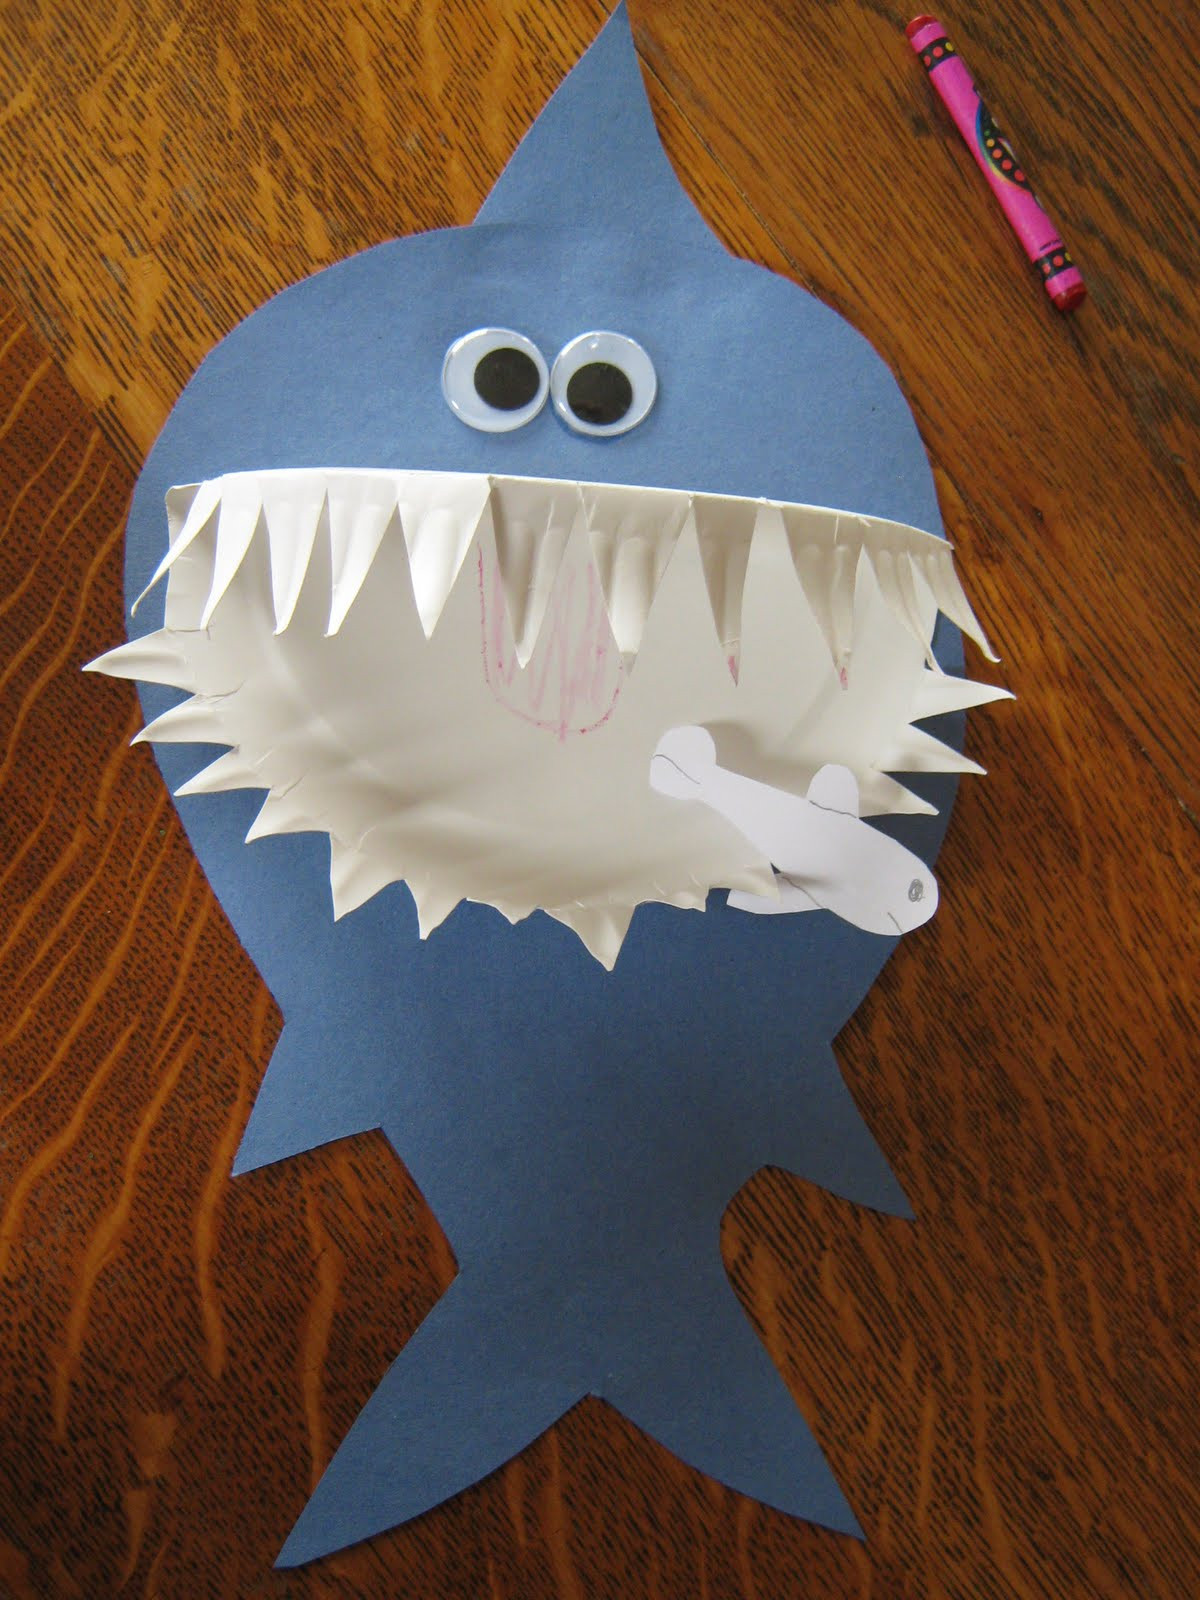 Preschool Projects Ideas  Paper Plate Shark